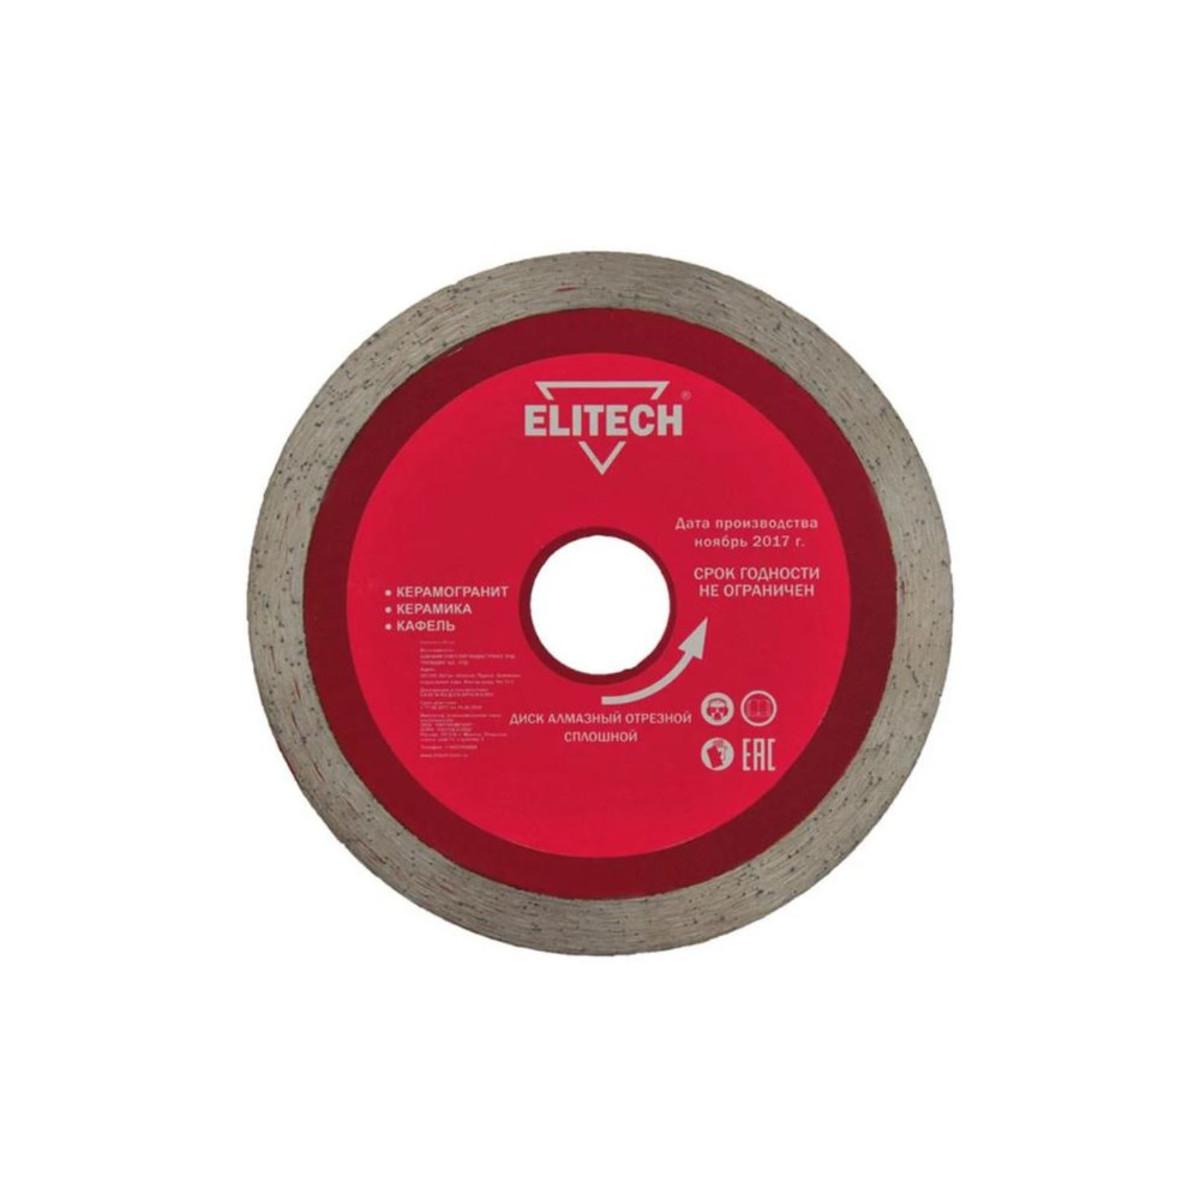 Диск Алмазный Elitech 180Х22 18200576